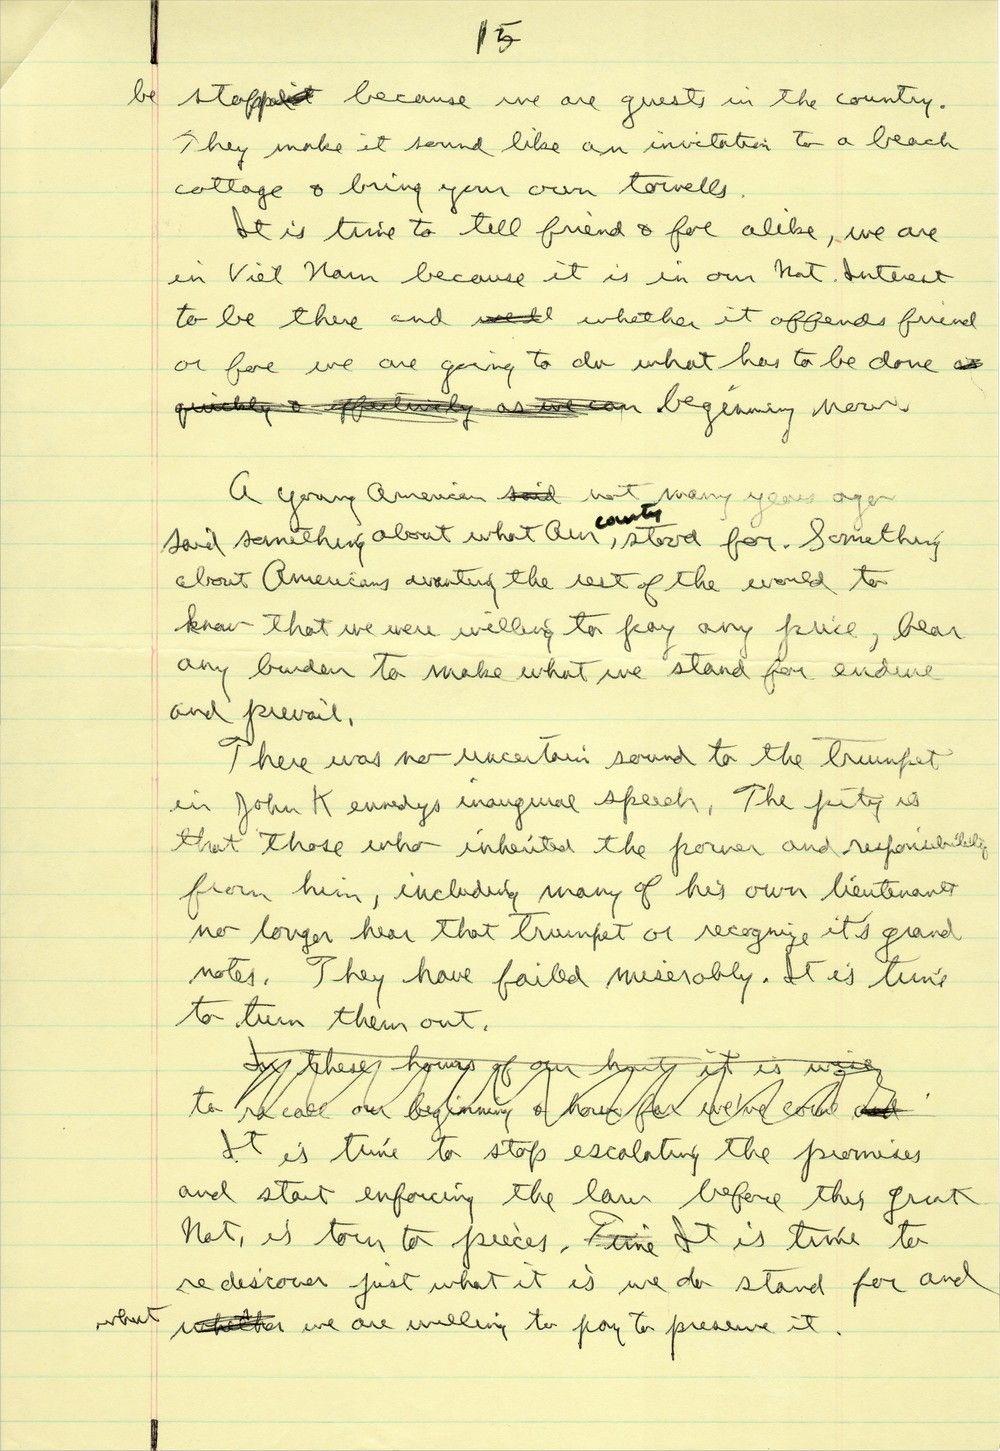 Page 17 transcript